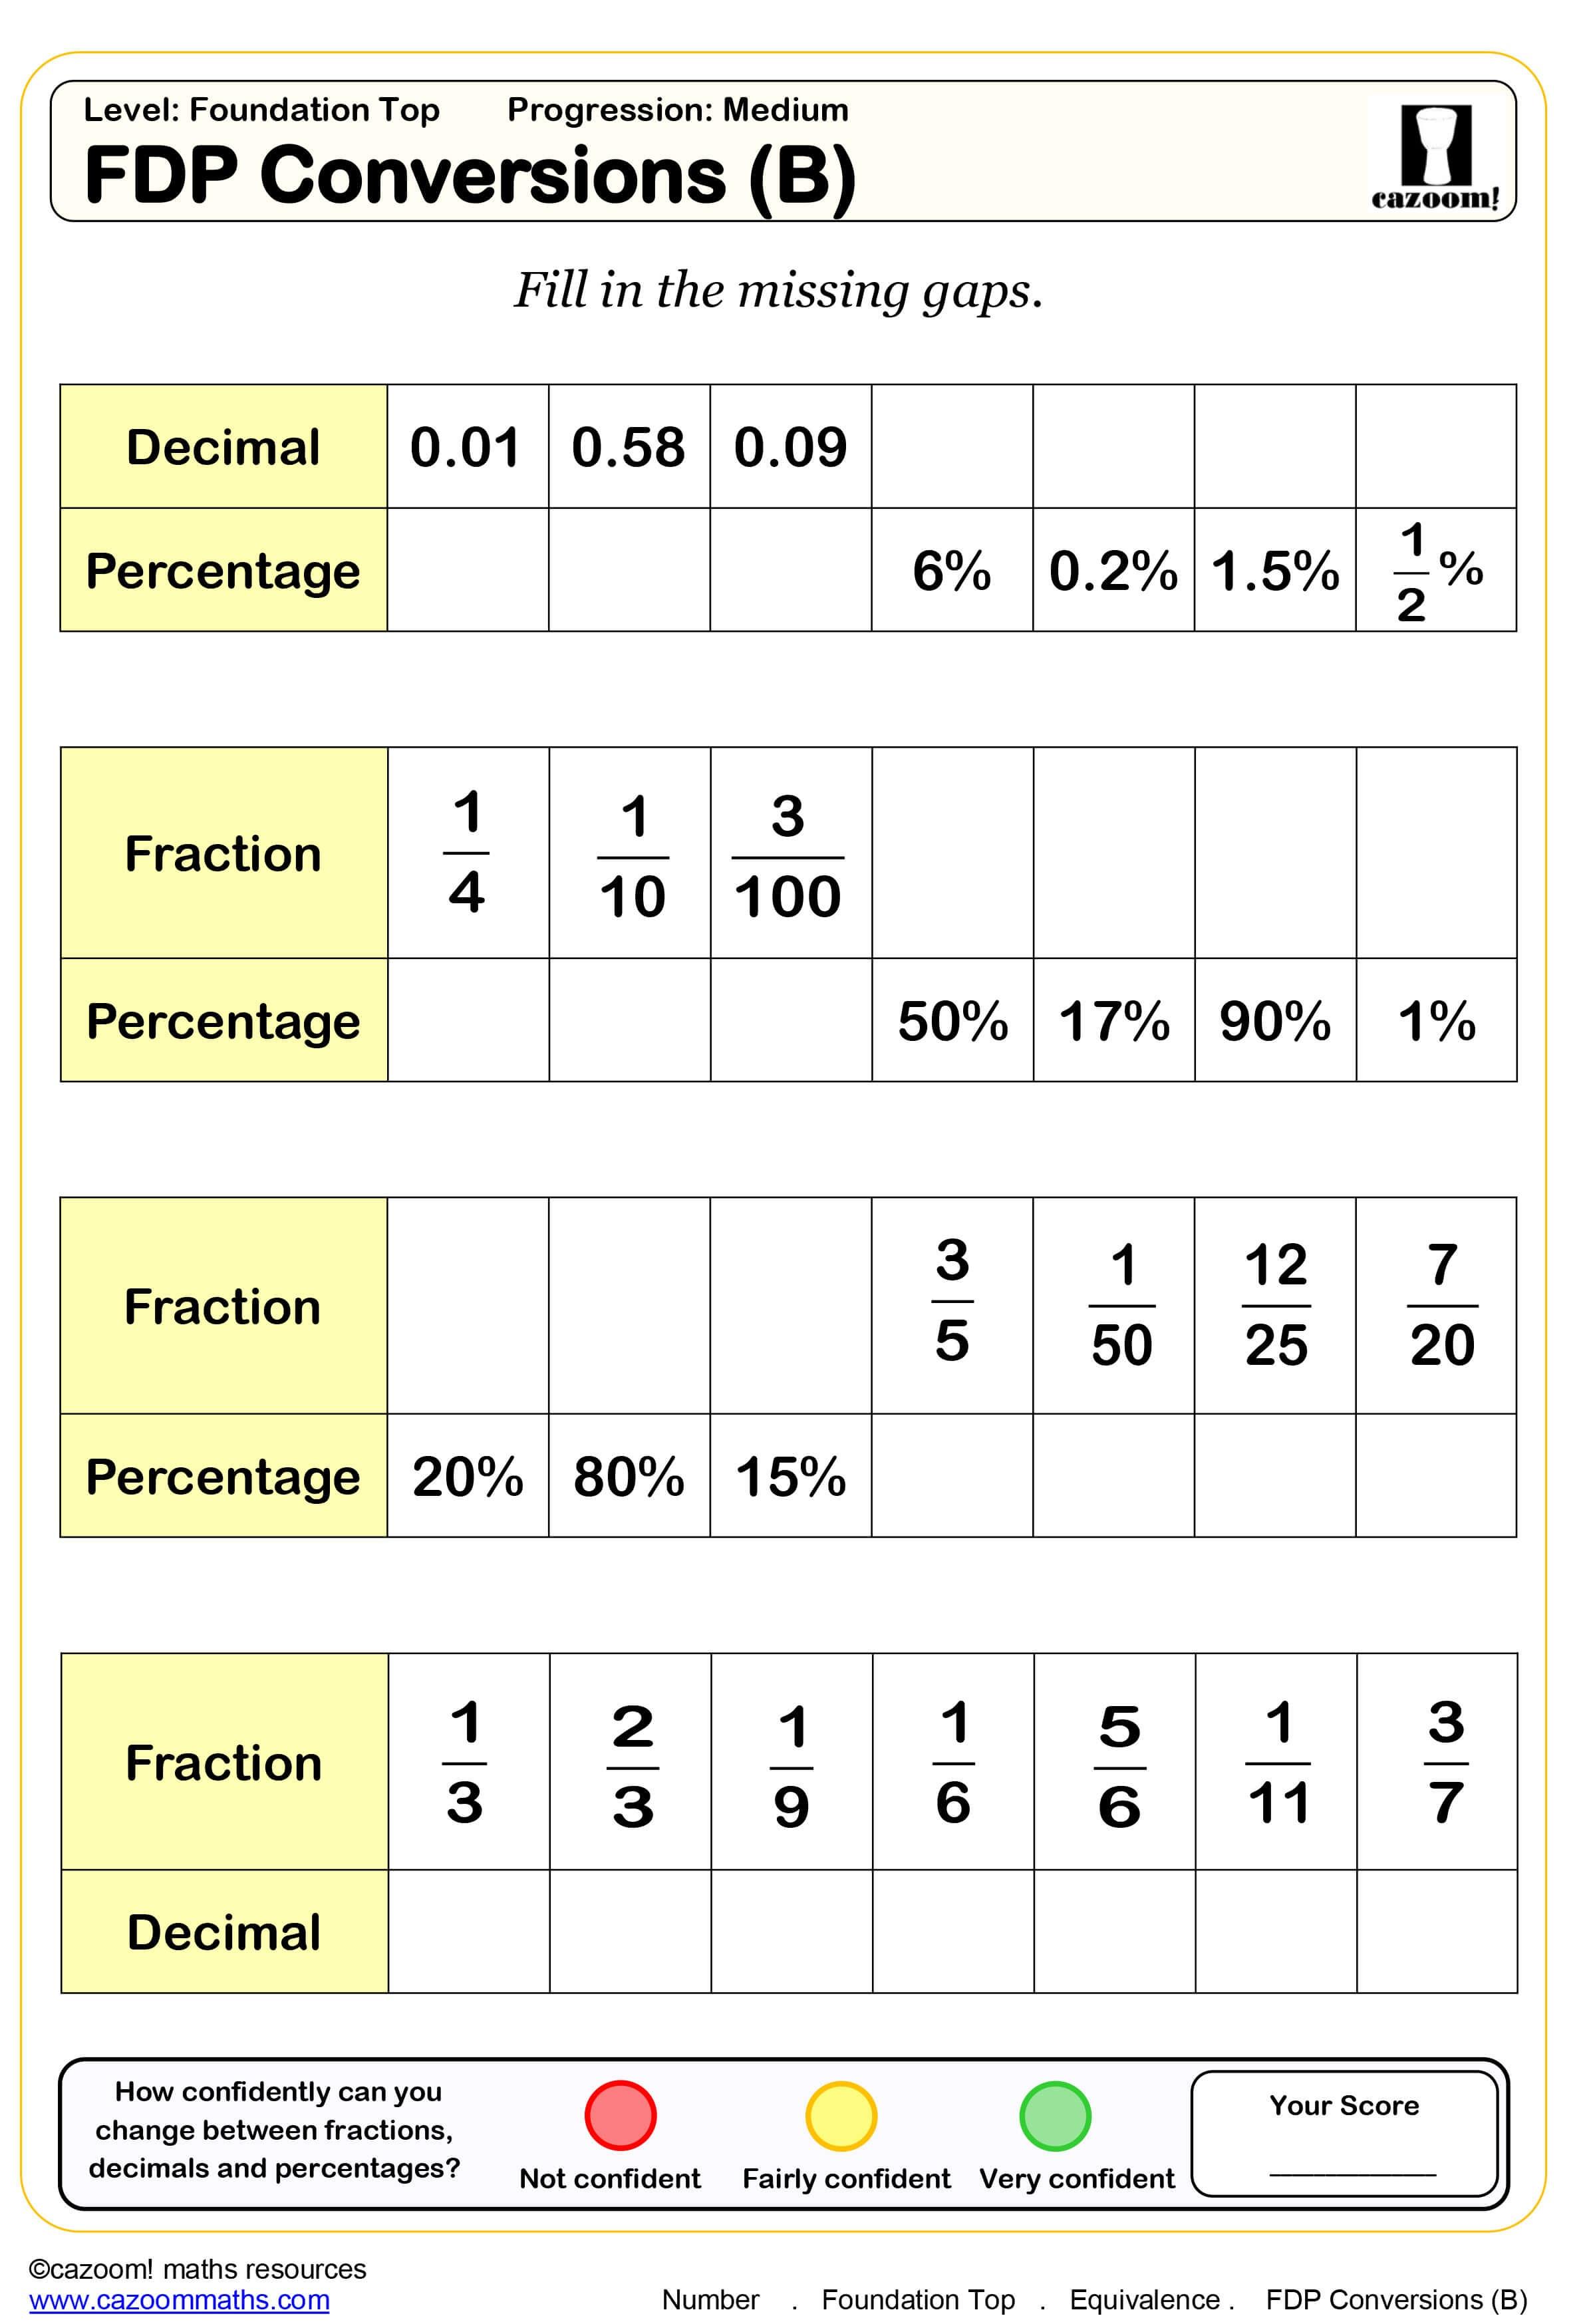 Year 9 Maths Worksheets | Printable Maths Worksheets - Grade 9 Math Worksheets Printable Free With Answers